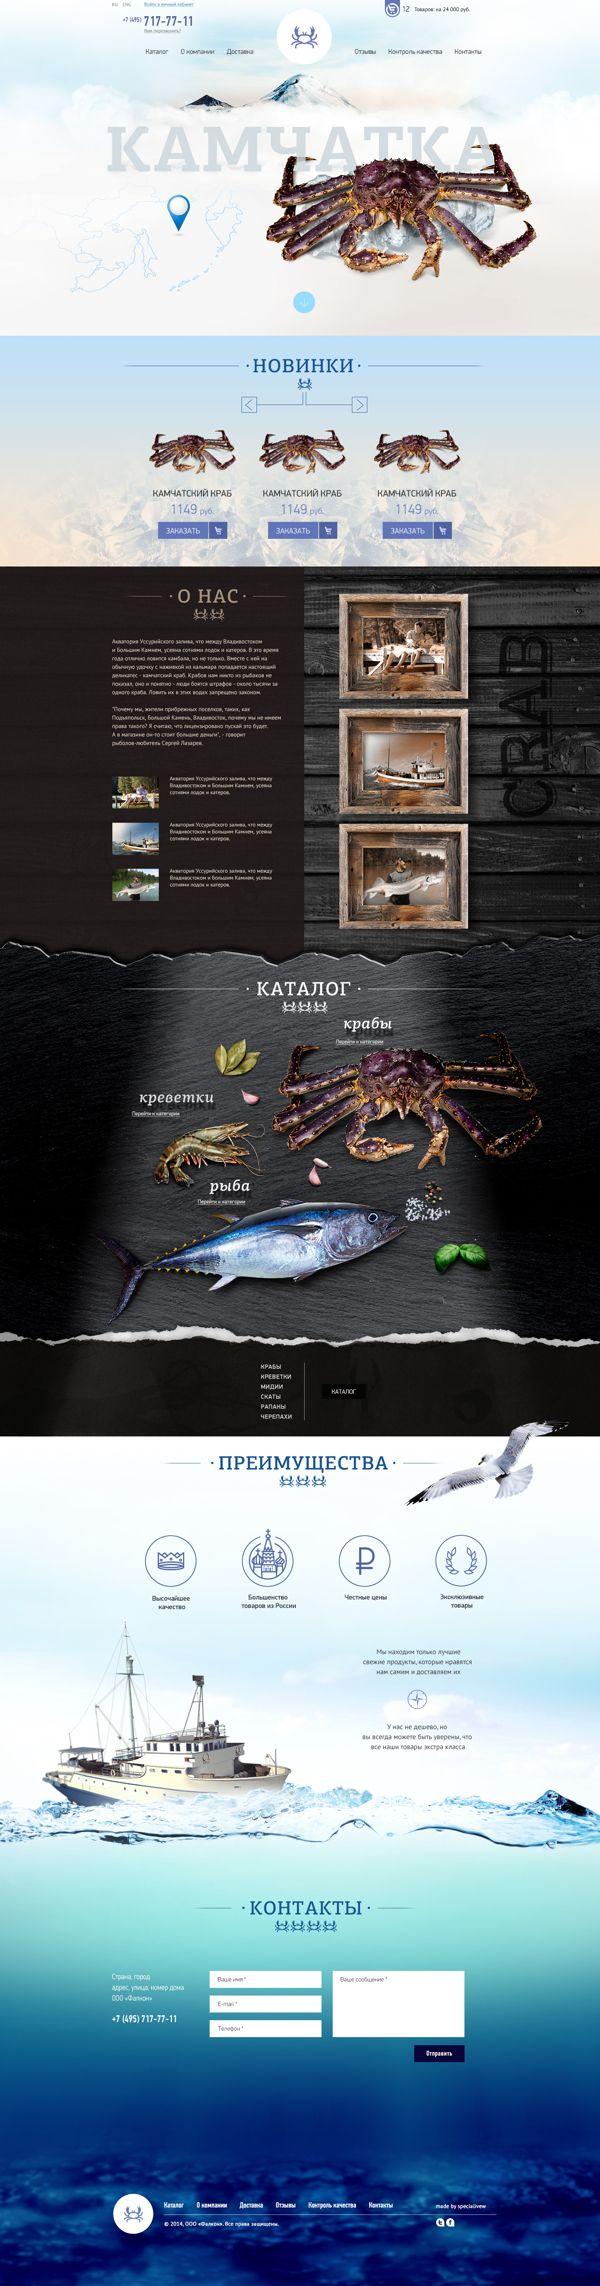 crabs on Behance